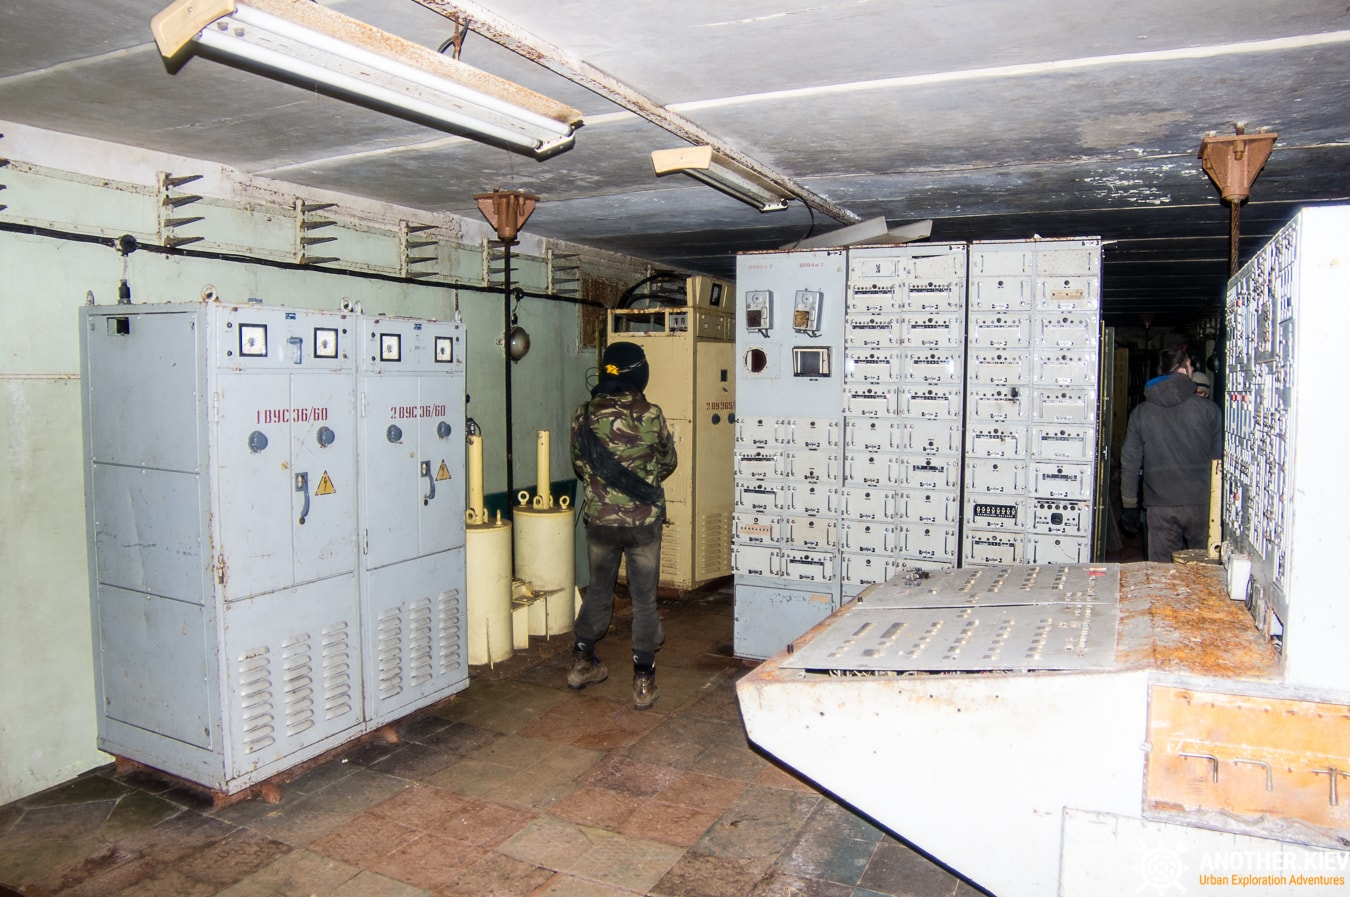 exploring-nuclear-bunker-duga-32 HIDDEN CHERNOBYL: EXPLORING NUCLEAR BUNKER  OF DUGA-3 RADAR STATION